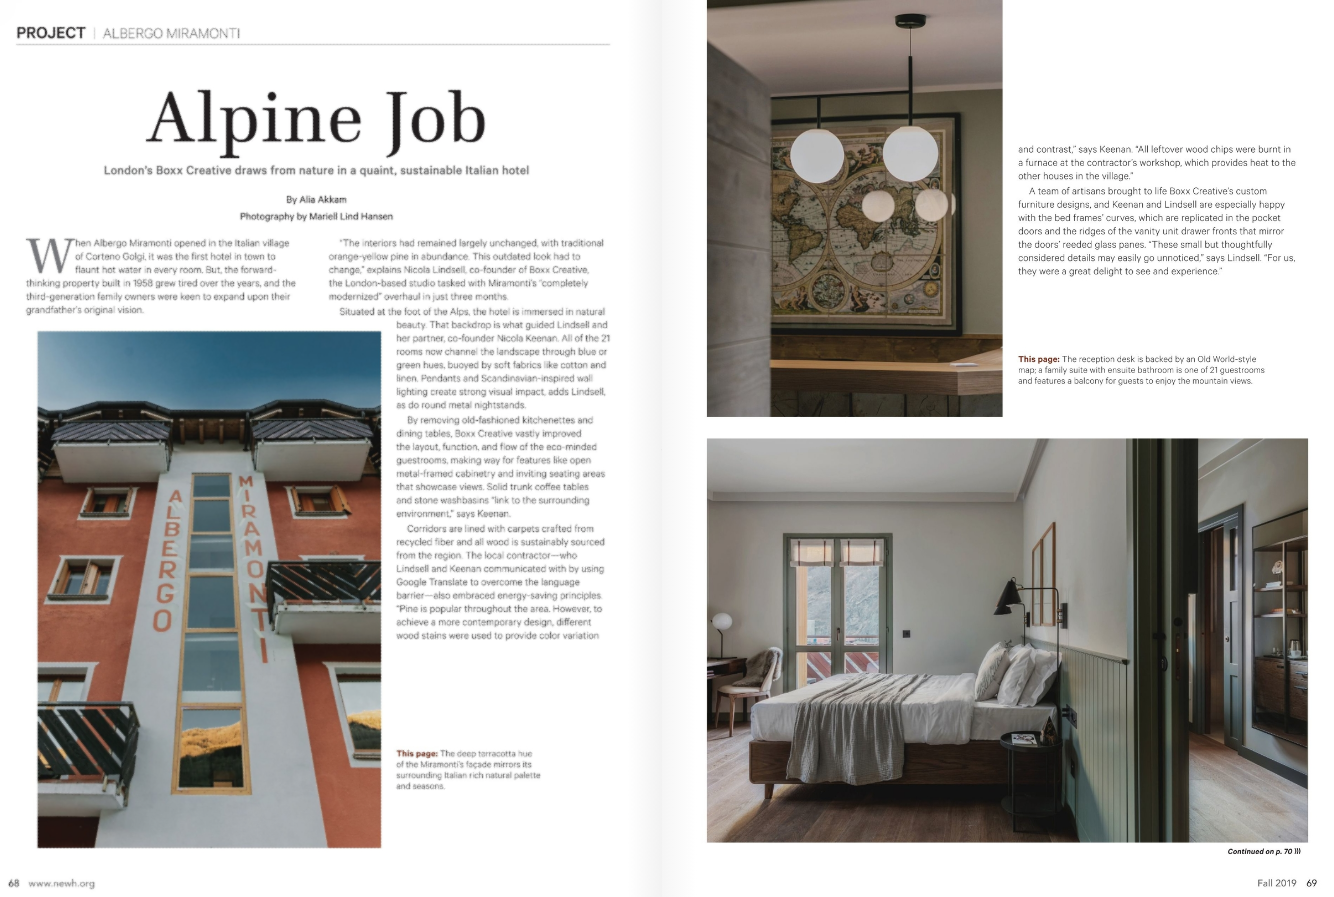 Image: The NewH Magazine 'Albergo Miramonti' Feature